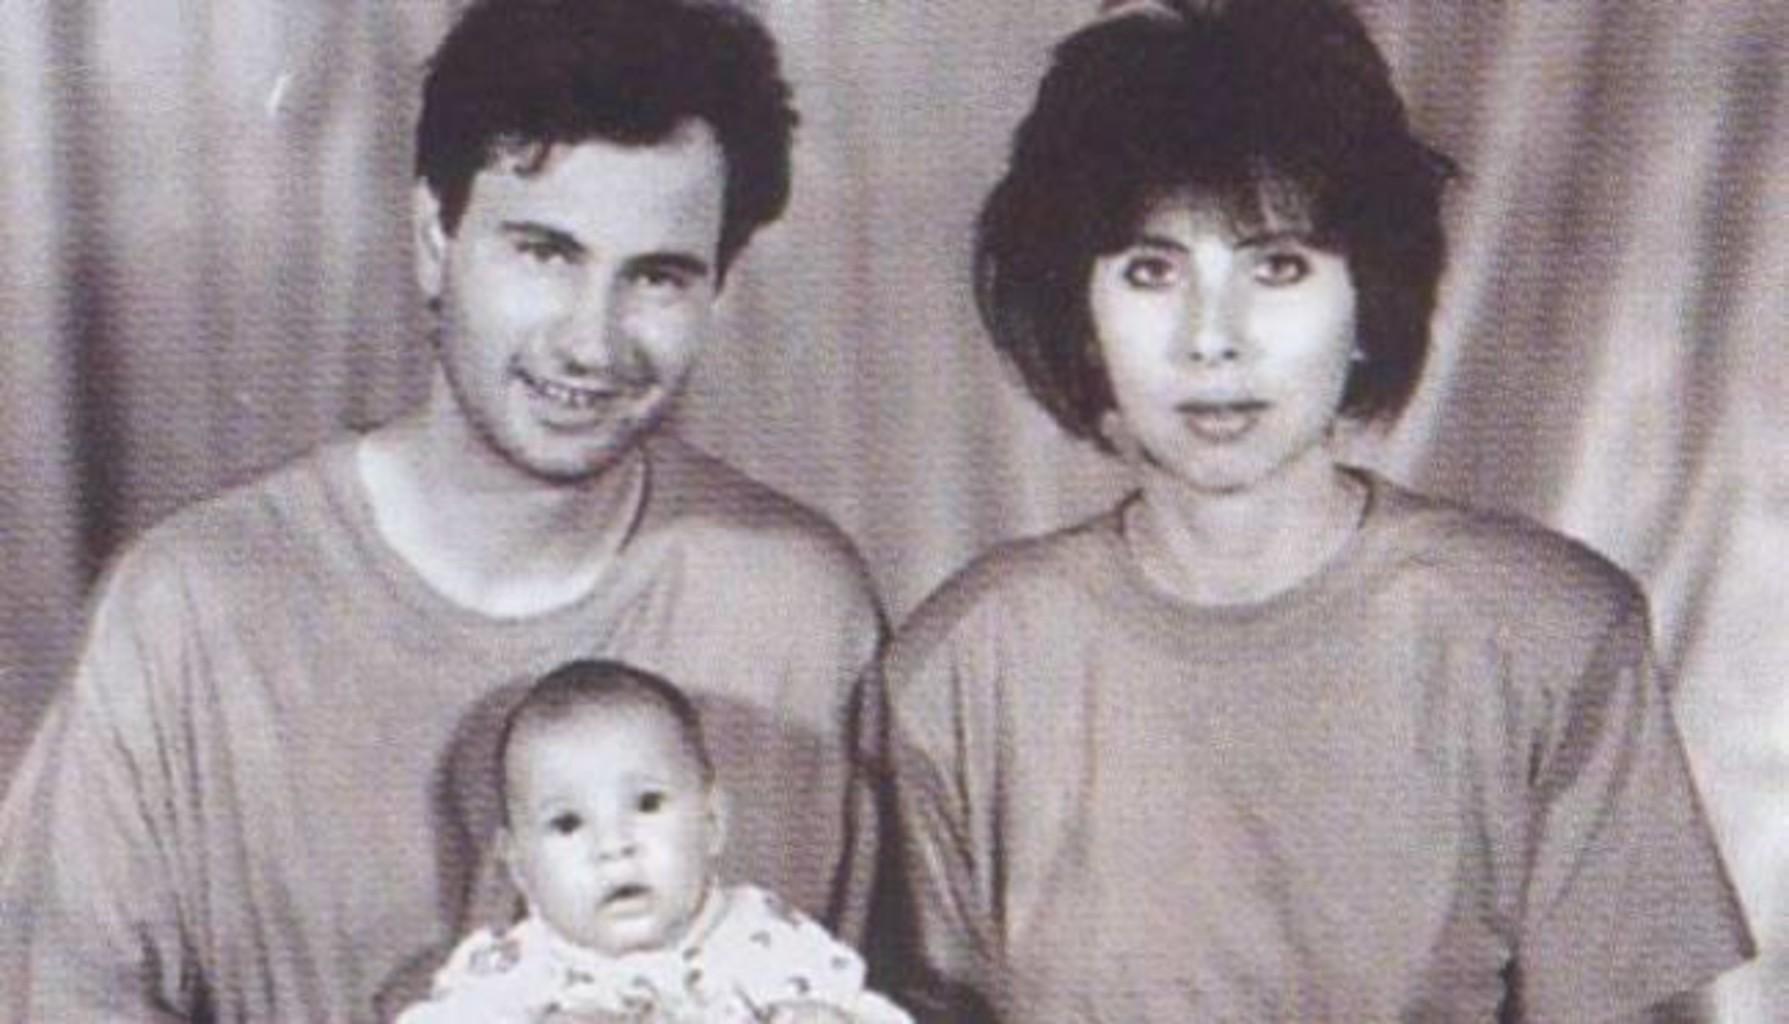 Bright singer valery meladze and his wife irina